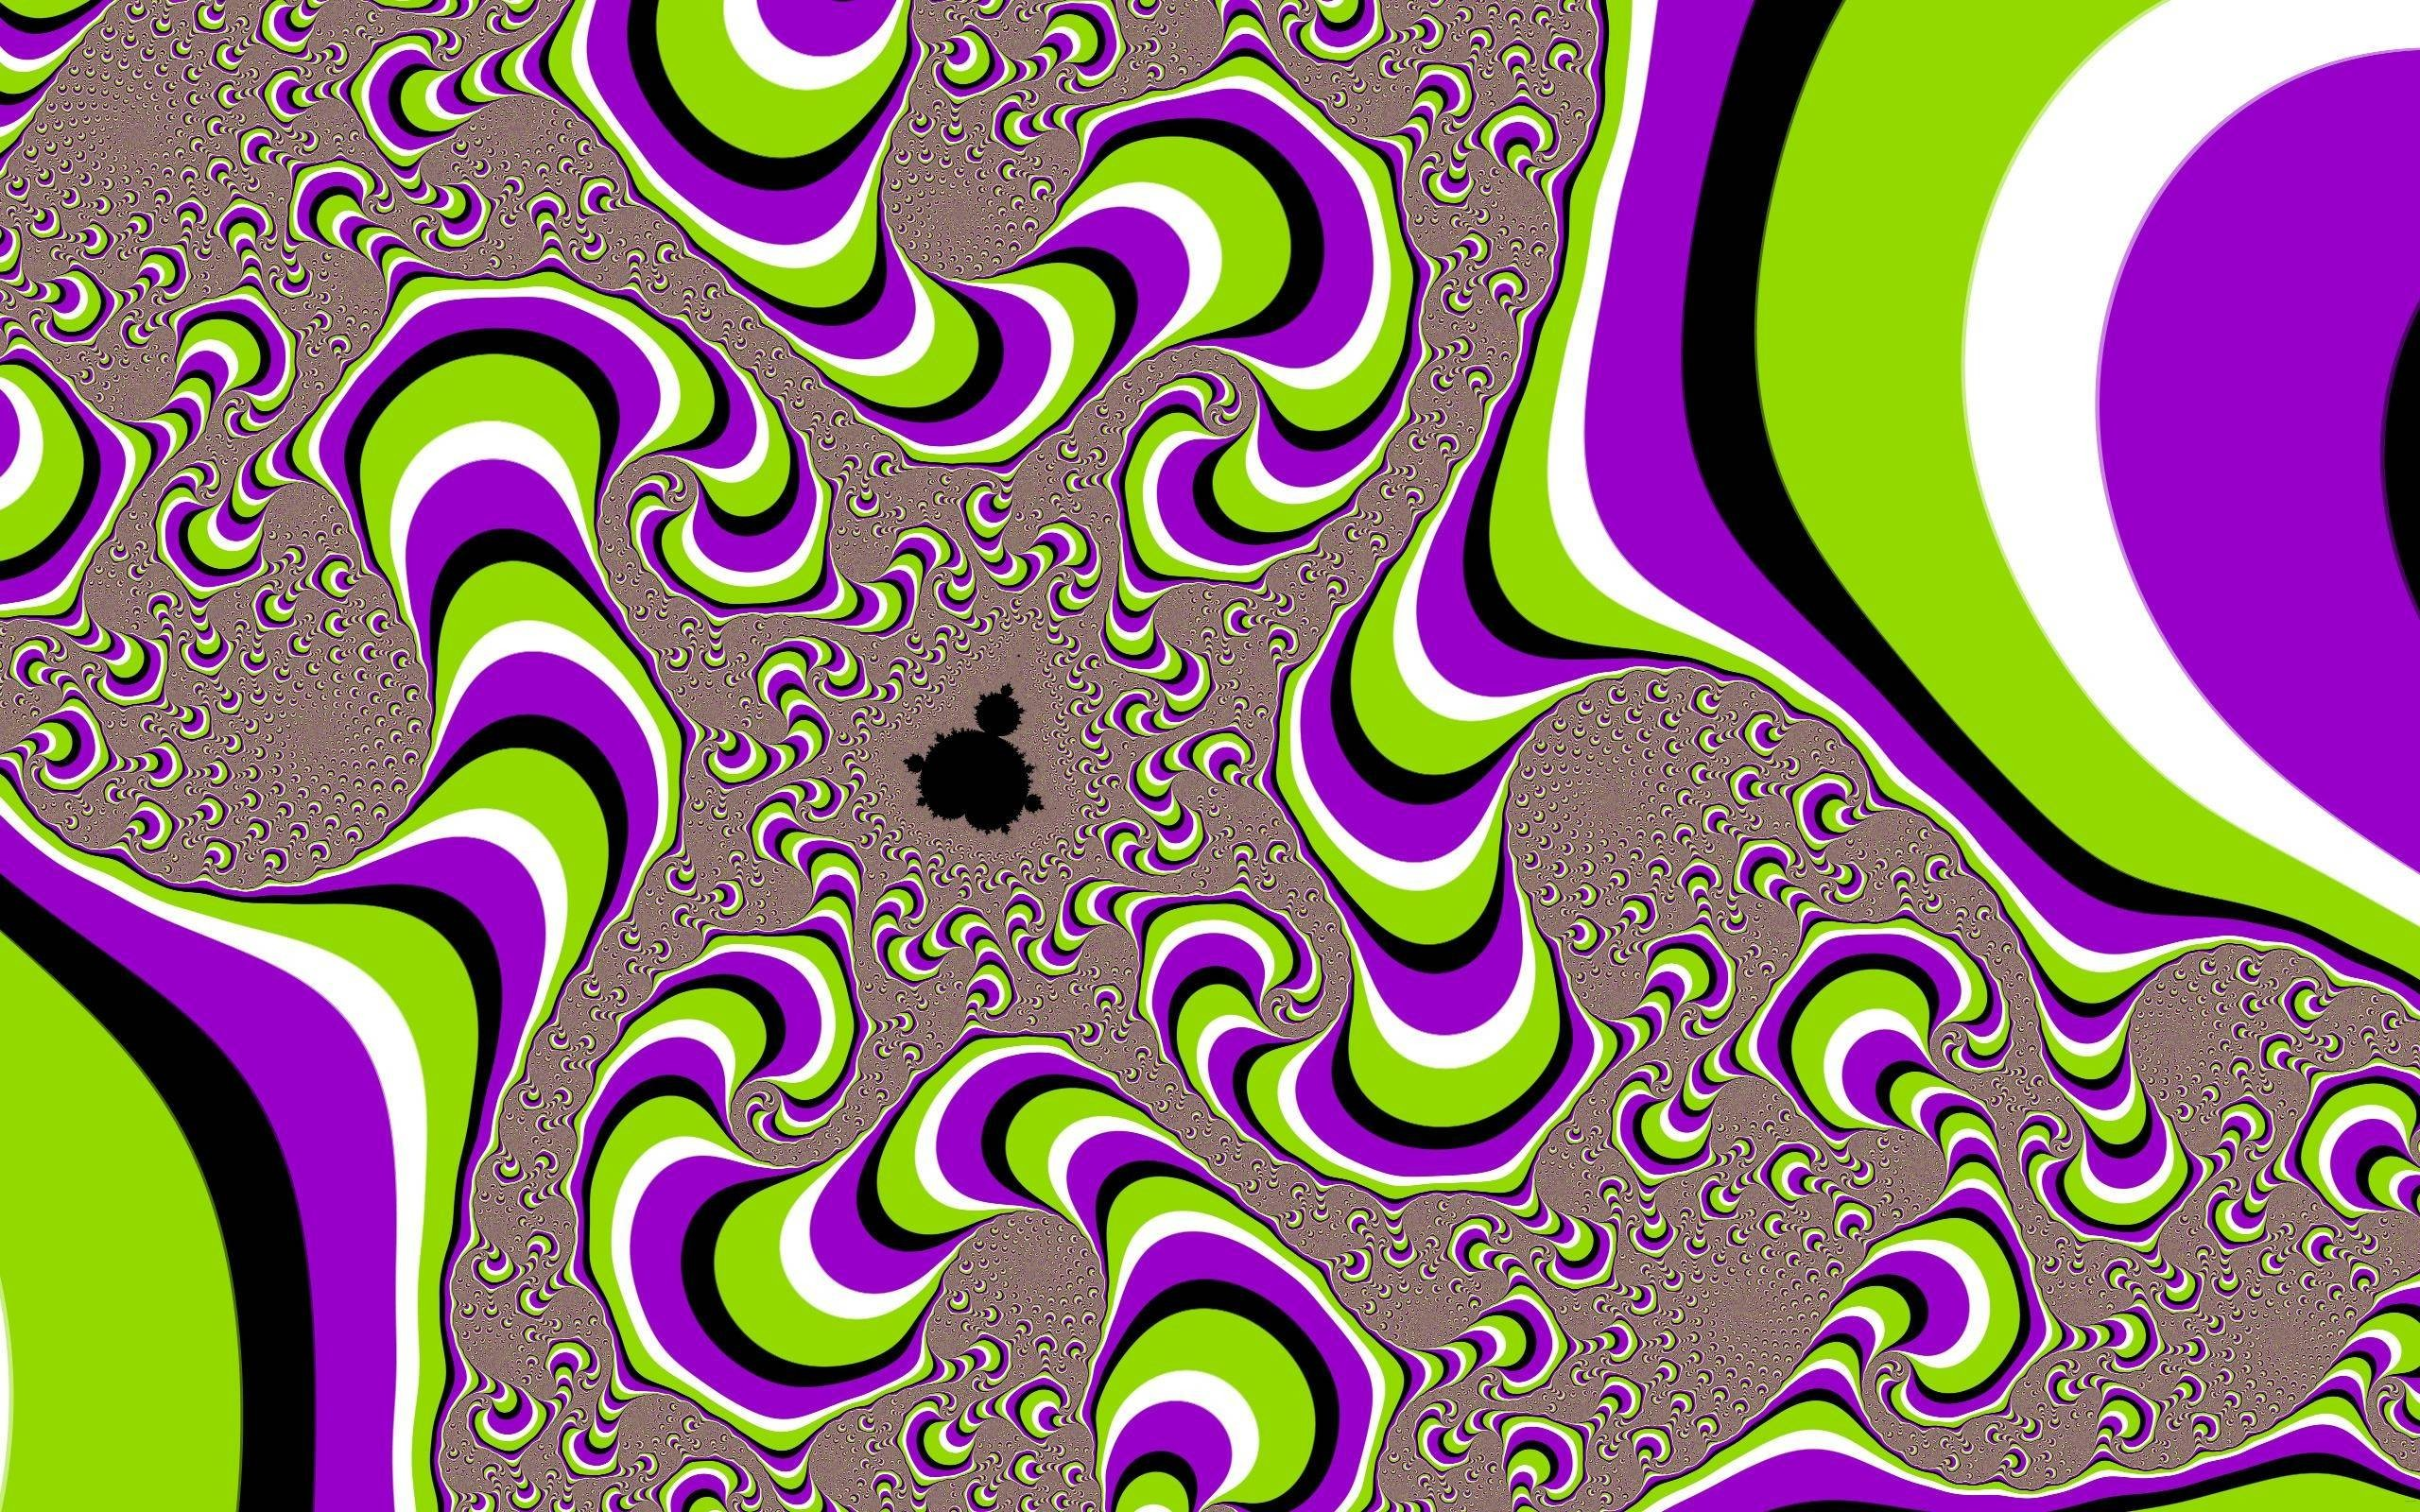 Illusion optical backgrounds for desktop photos